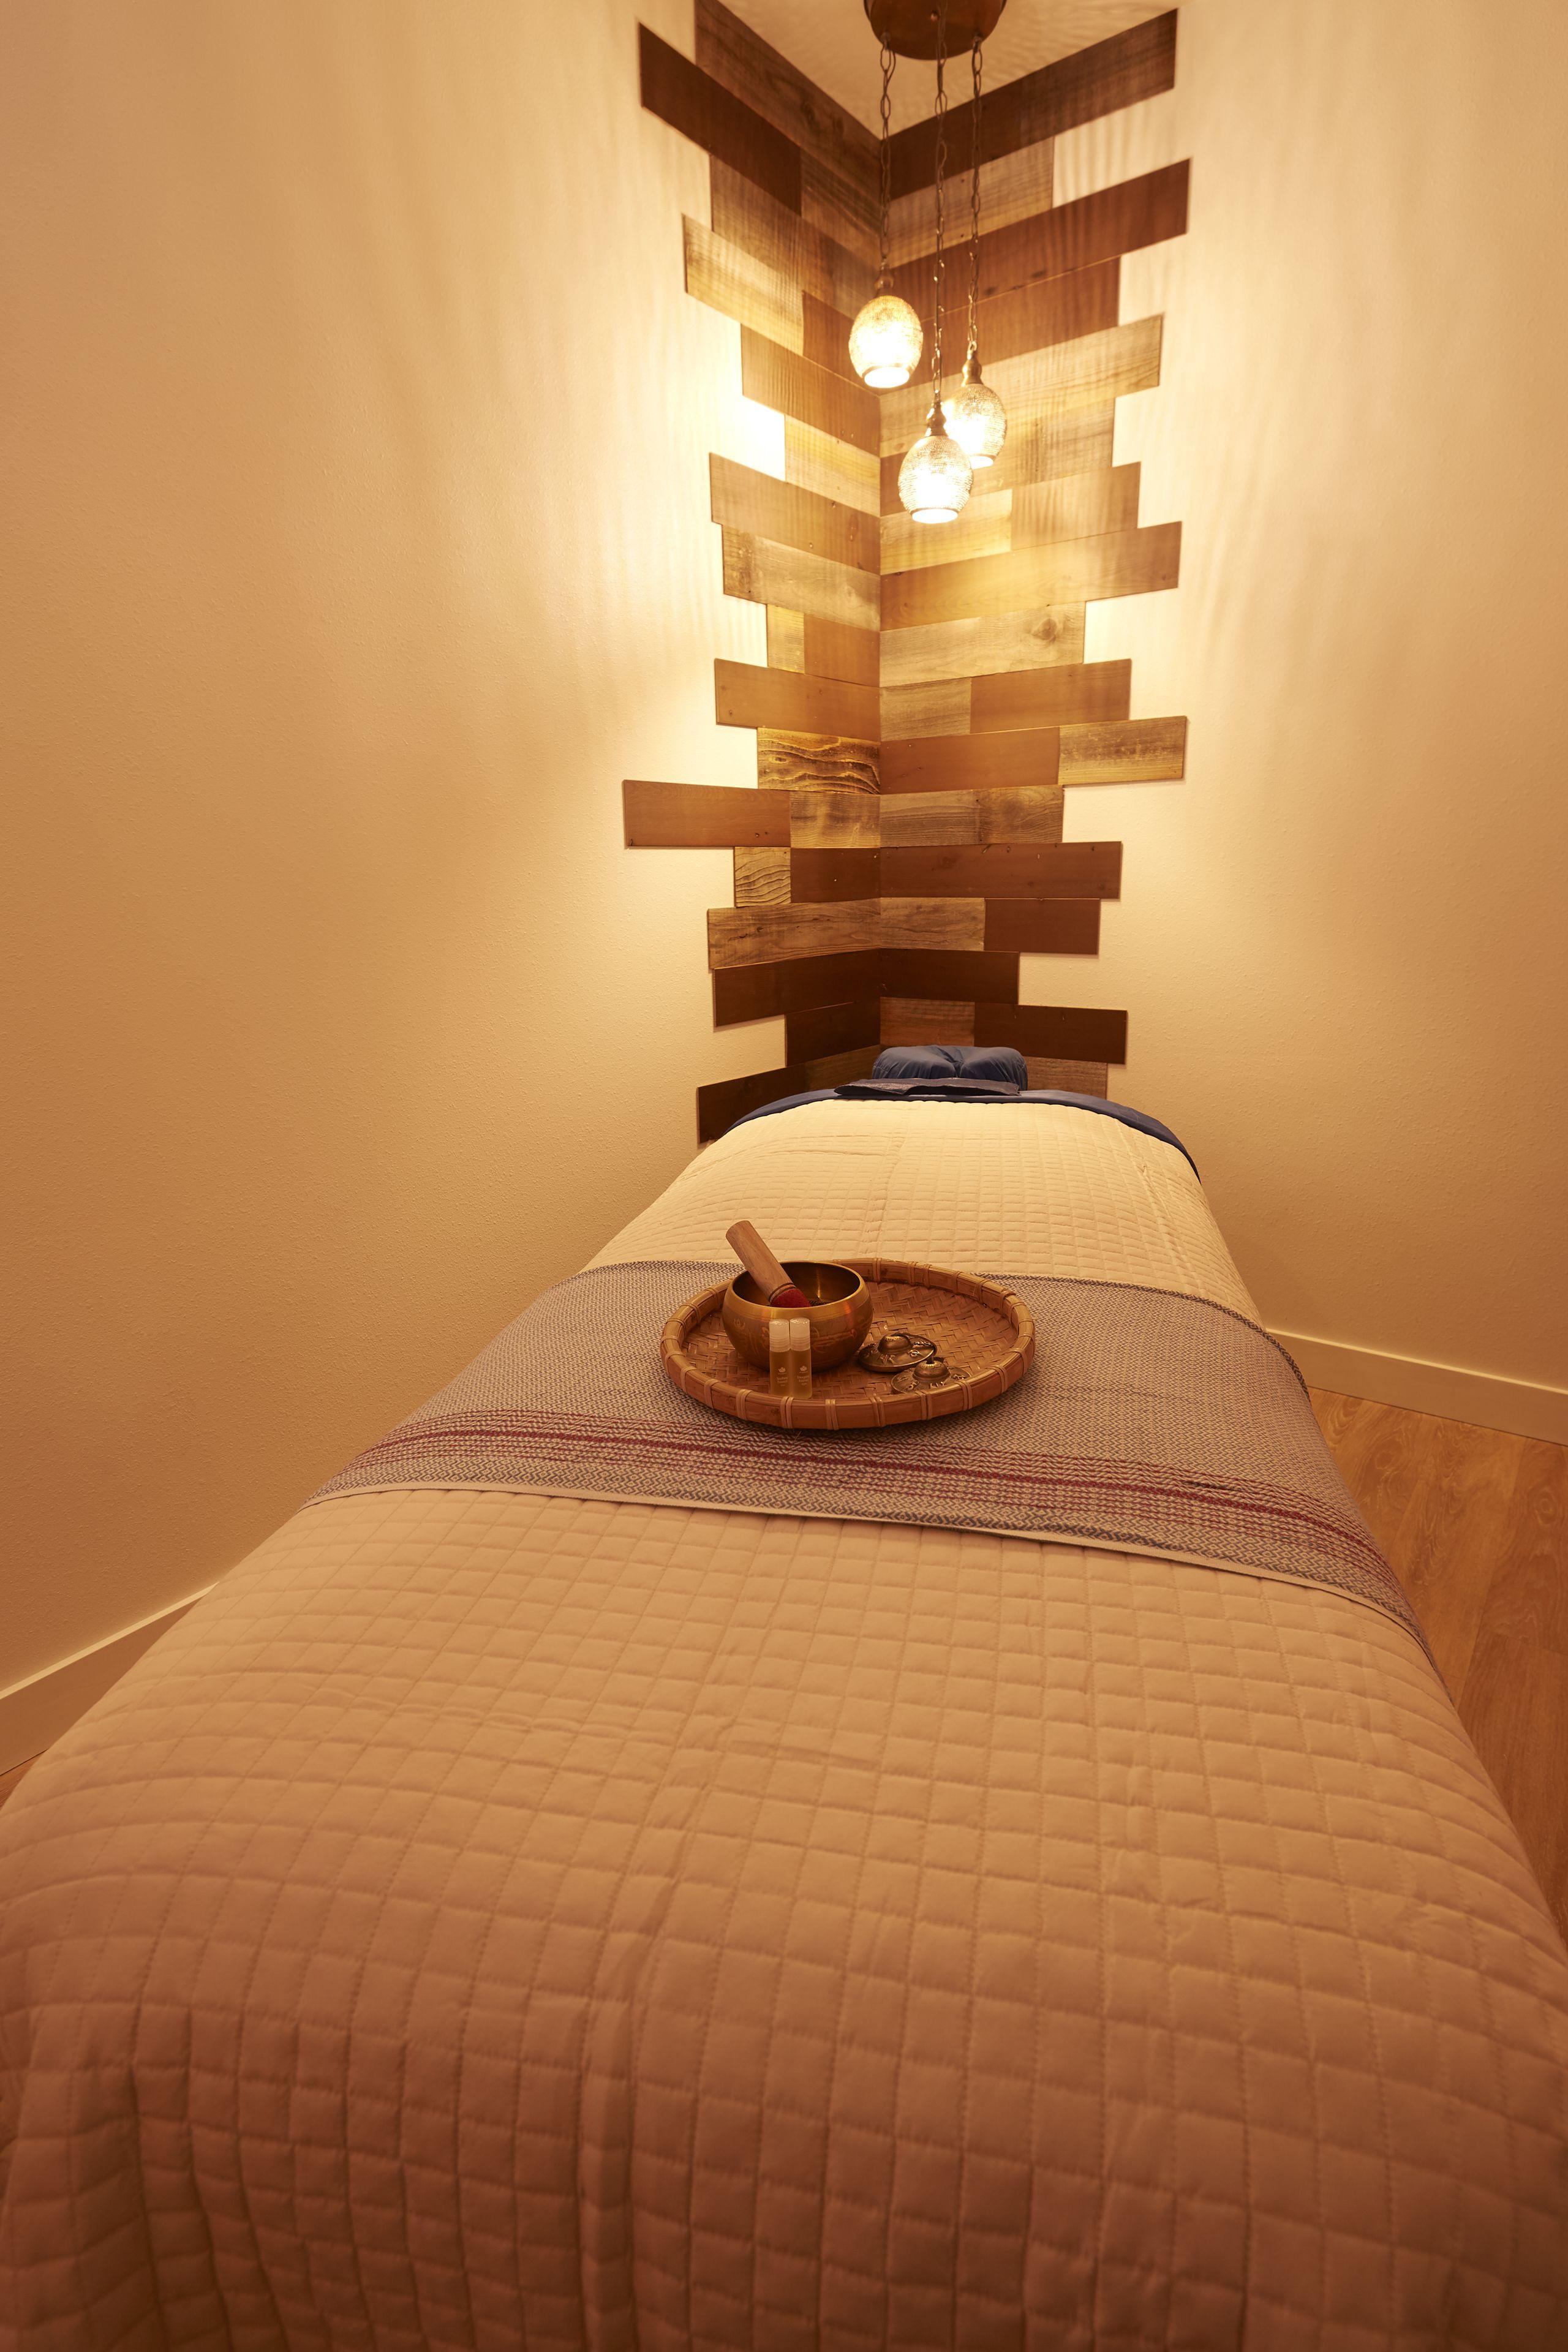 90 Min. Therapeutic Massage